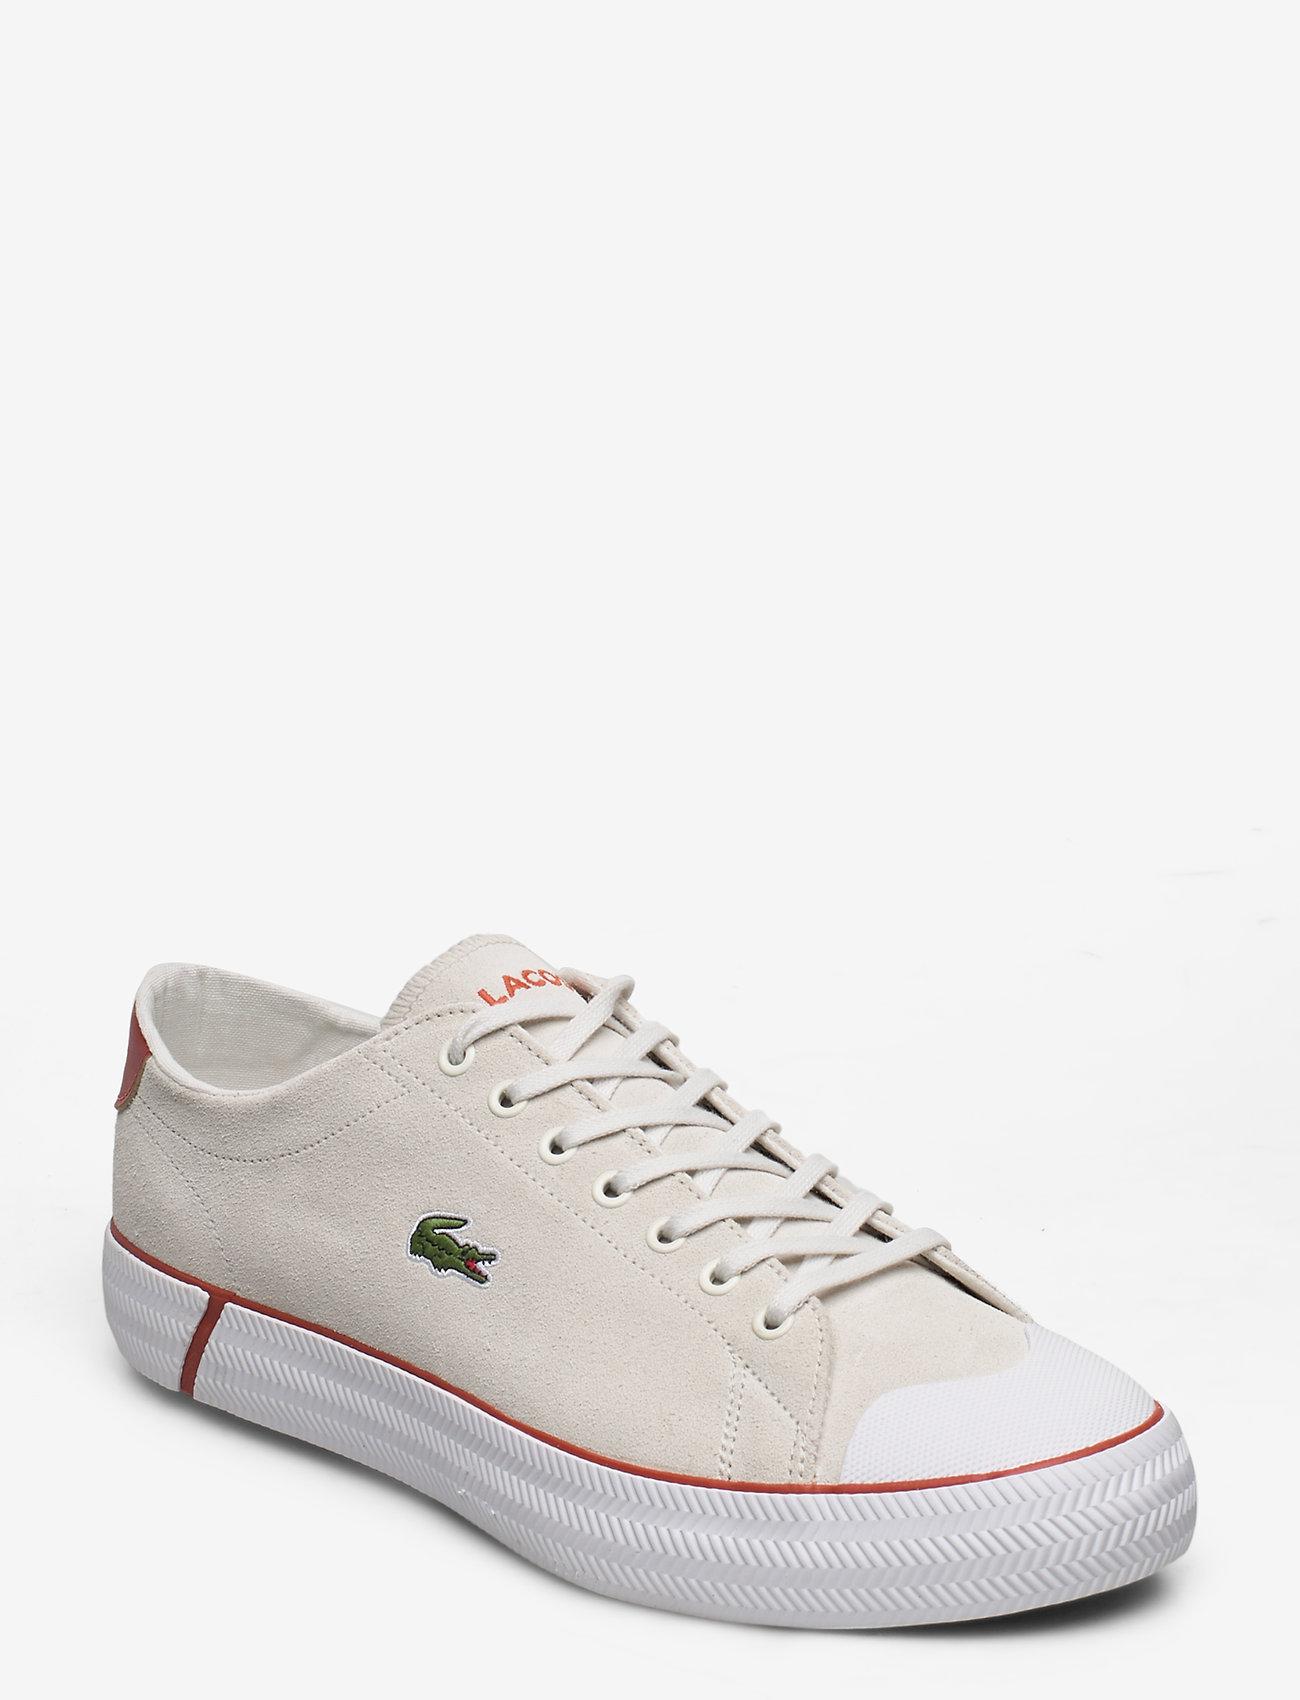 Lacoste Shoes - GRIPSHOT 120 1 CMA - przed kostkę - off wht/org sde - 0